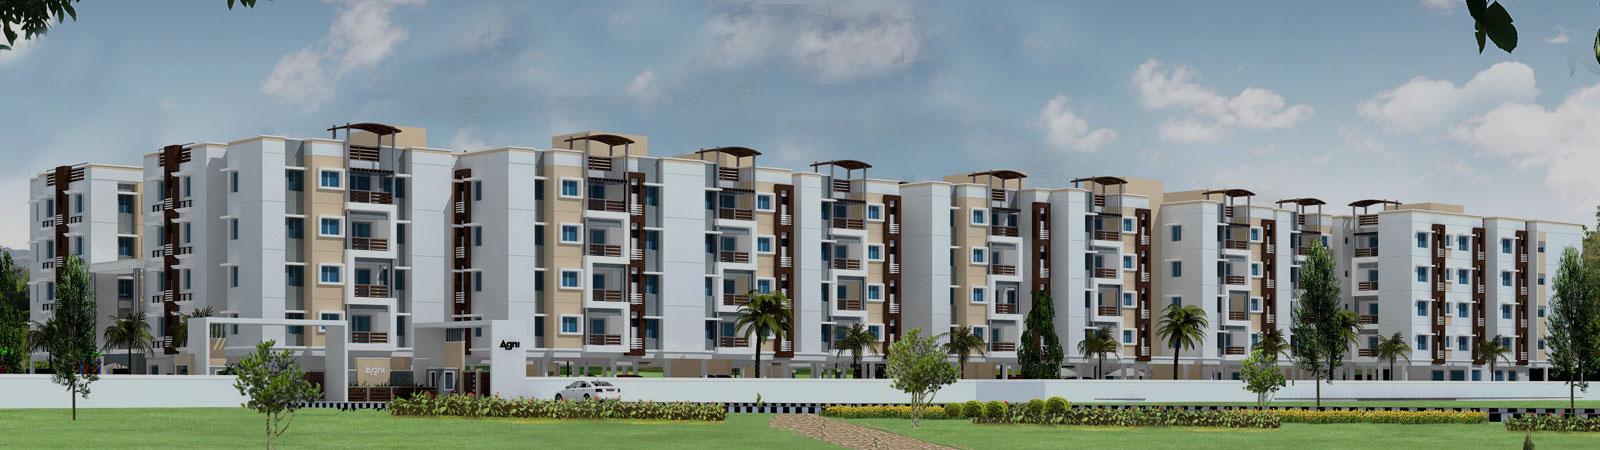 Purchase 2 BHK Flats near Ambattur at a Reasonable Price